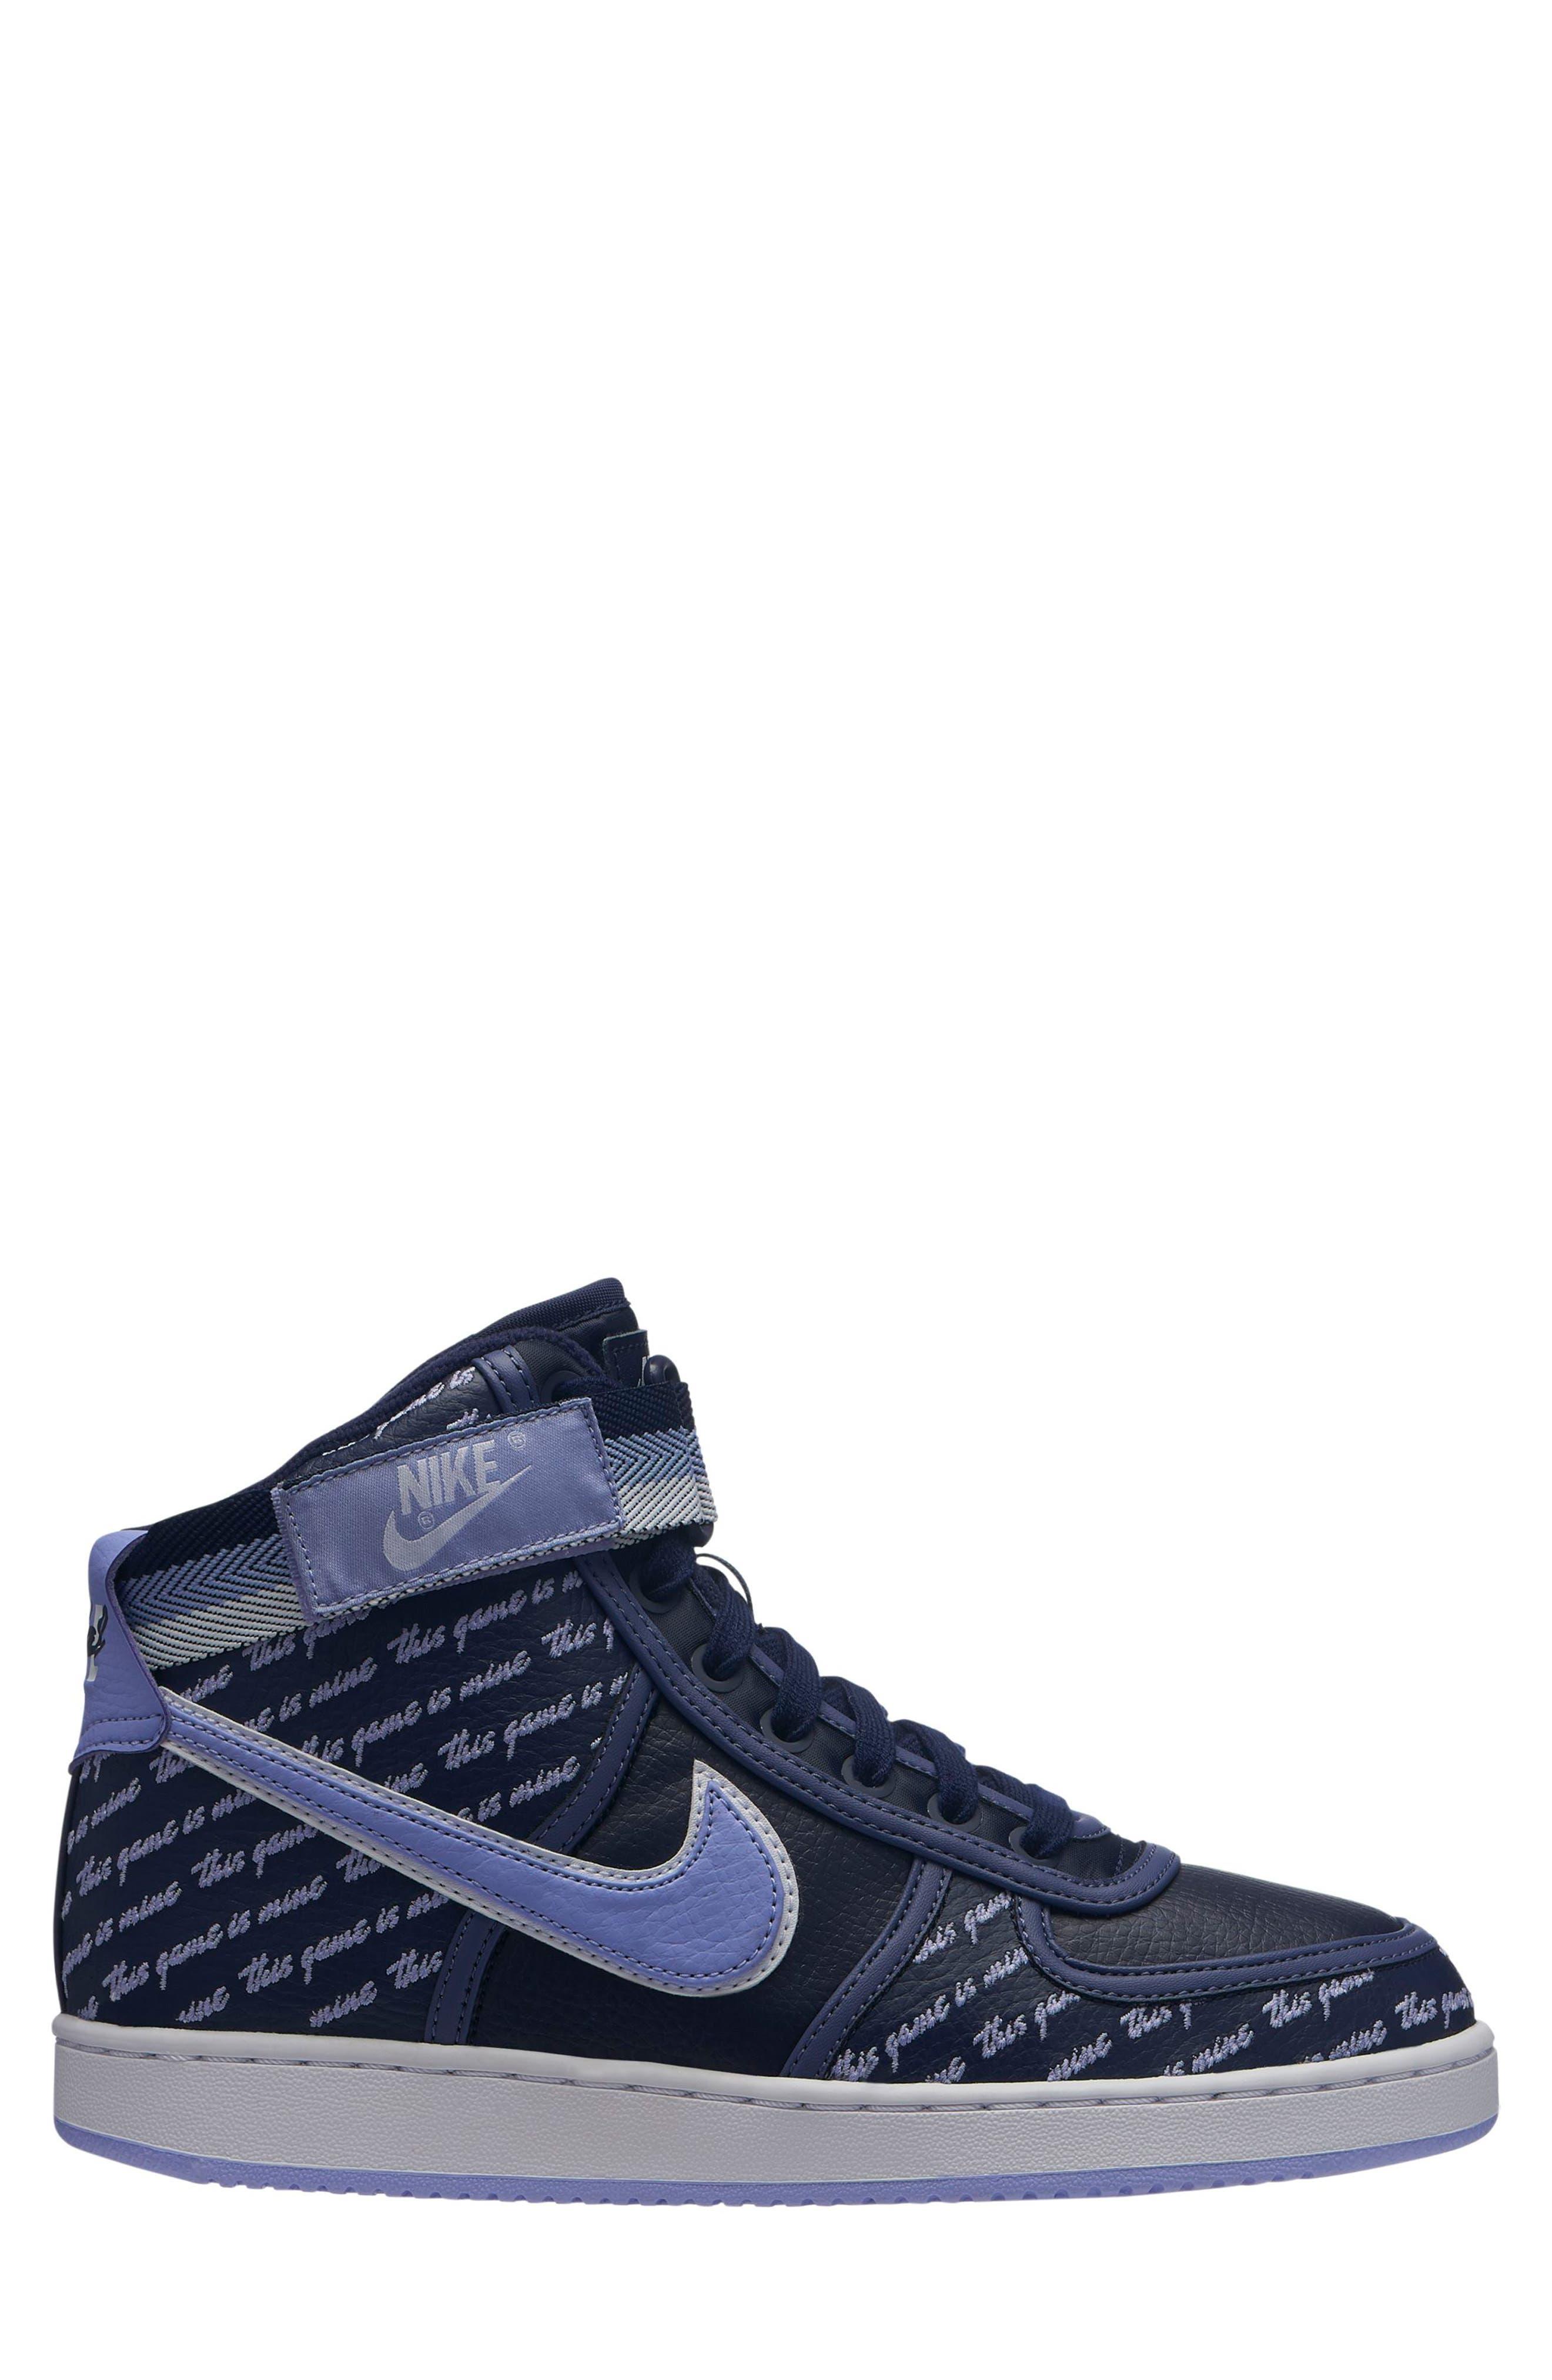 NIKE Vandal High Lux Sneaker, Main, color, 401